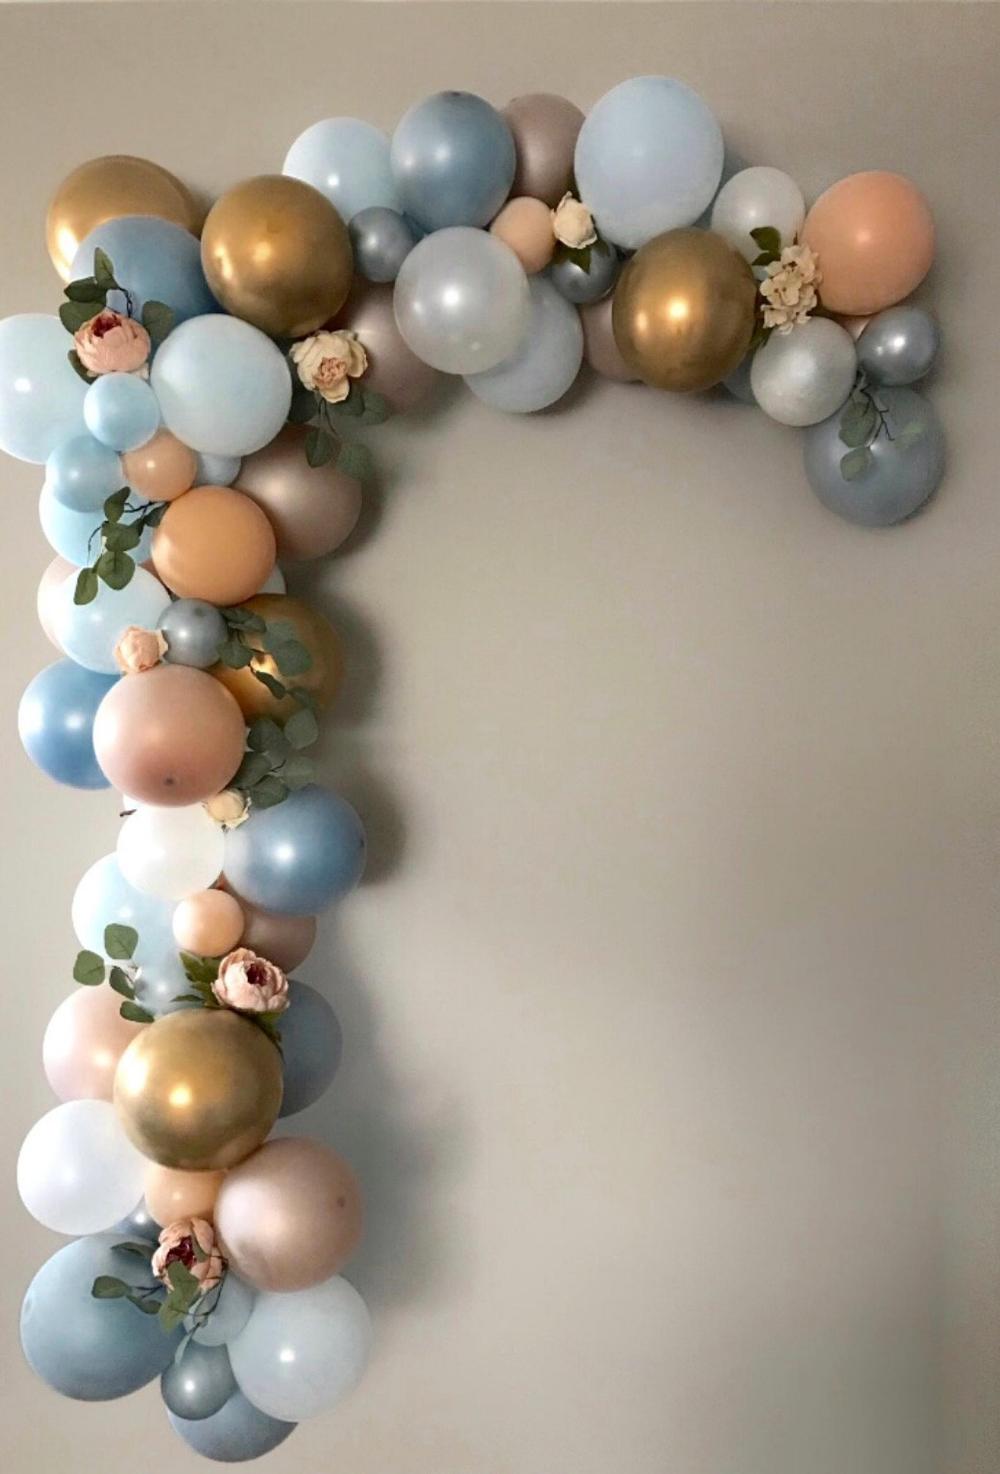 136 pcs Baby Shower Balloon Garland Kit-Shades of Blue-Little One-1st Birthday Balloon garland-Tassel Garland-Its a Boy #balloonarch